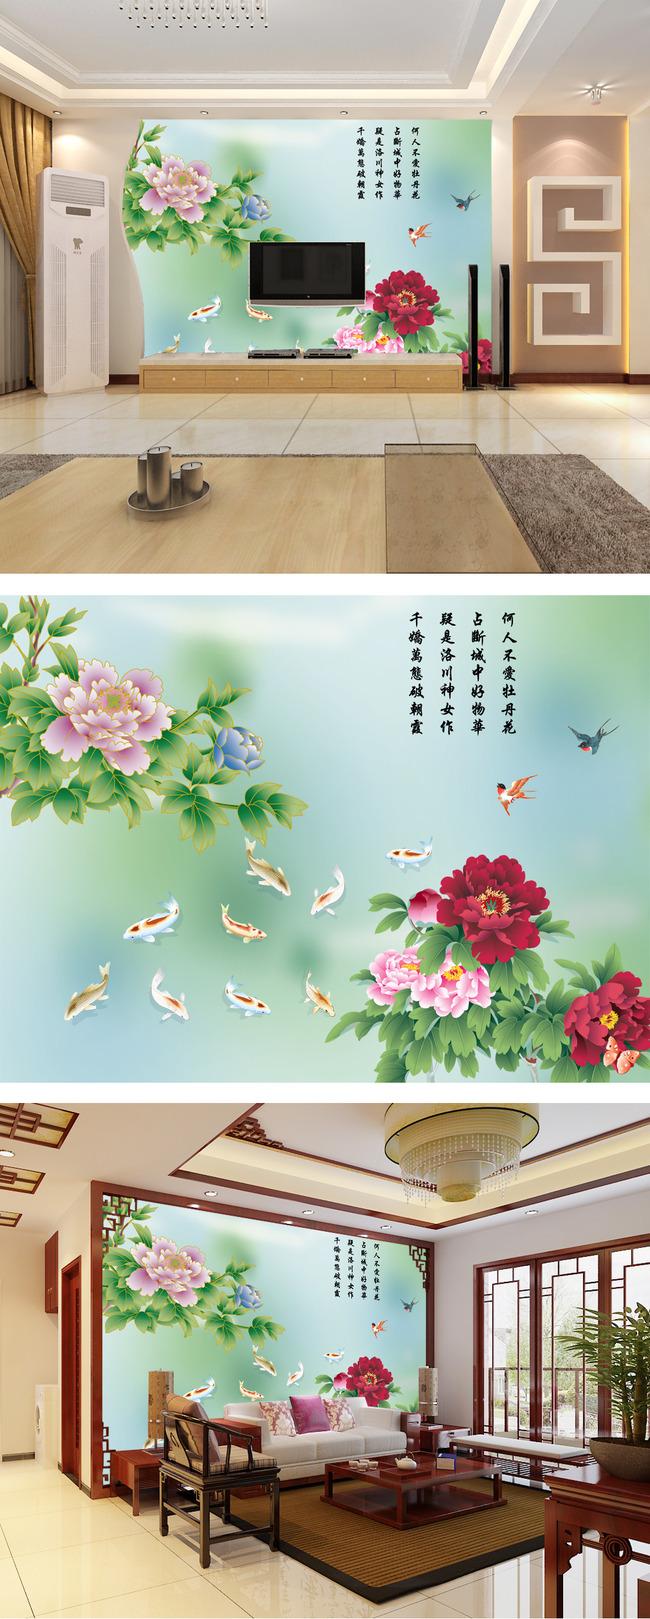 【psd】高清手绘牡丹花鸟电视背景墙